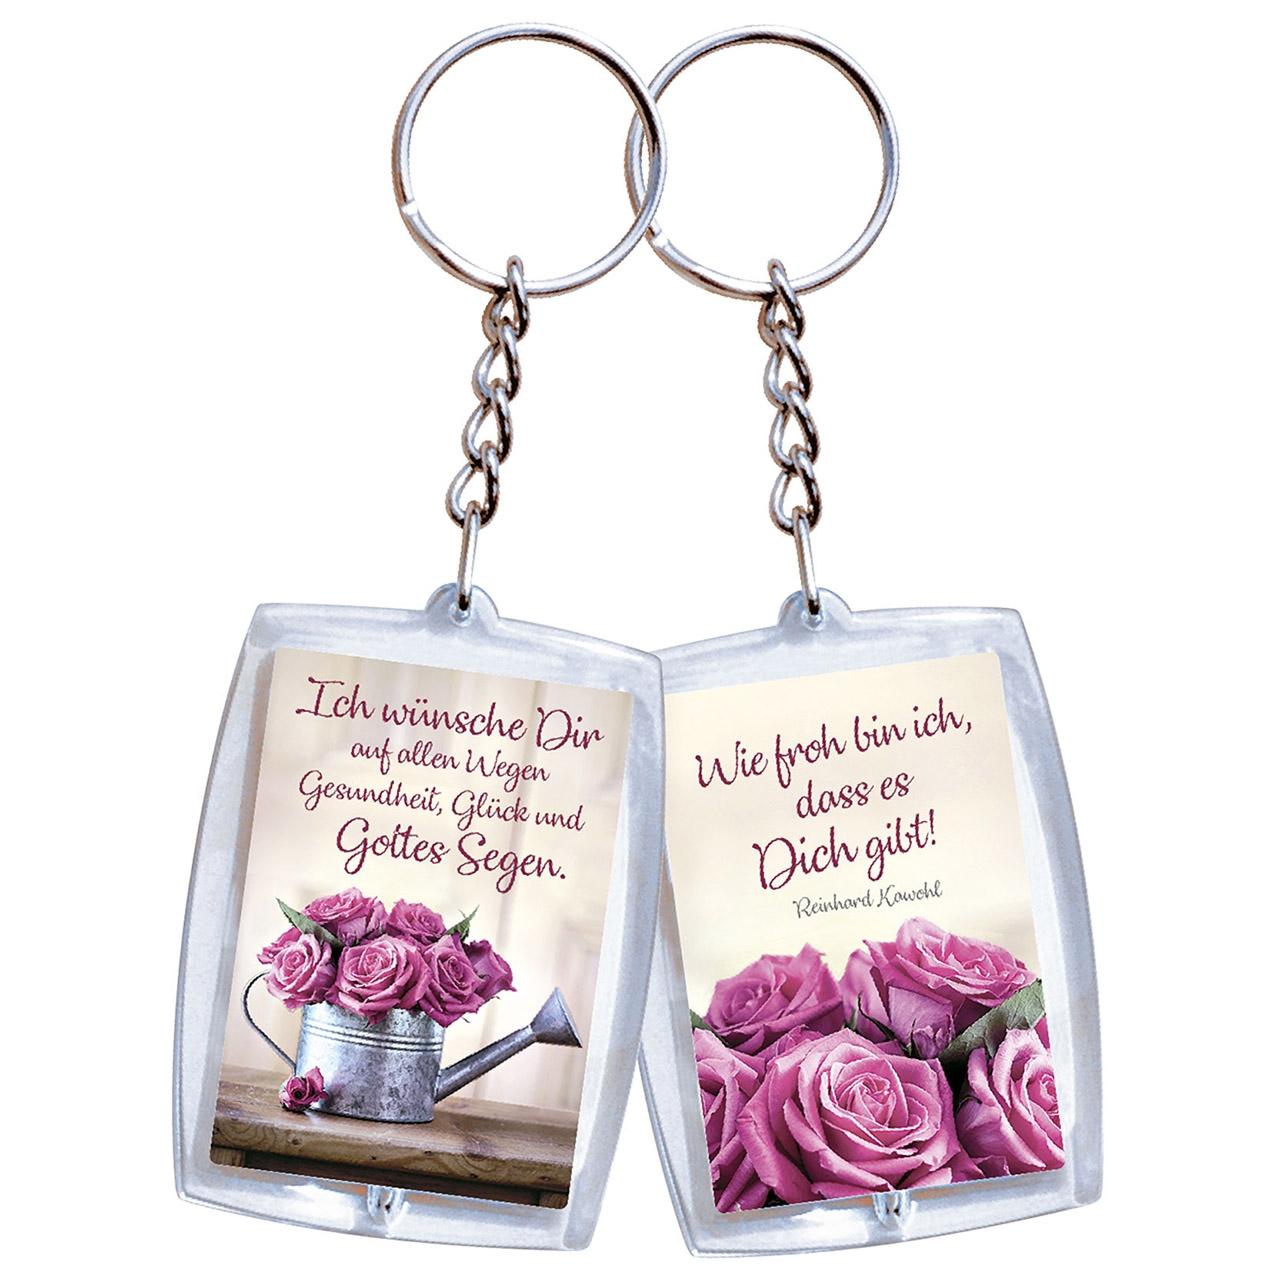 Schlüsselanhänger: Ich wünsche dir auf allen Wegen